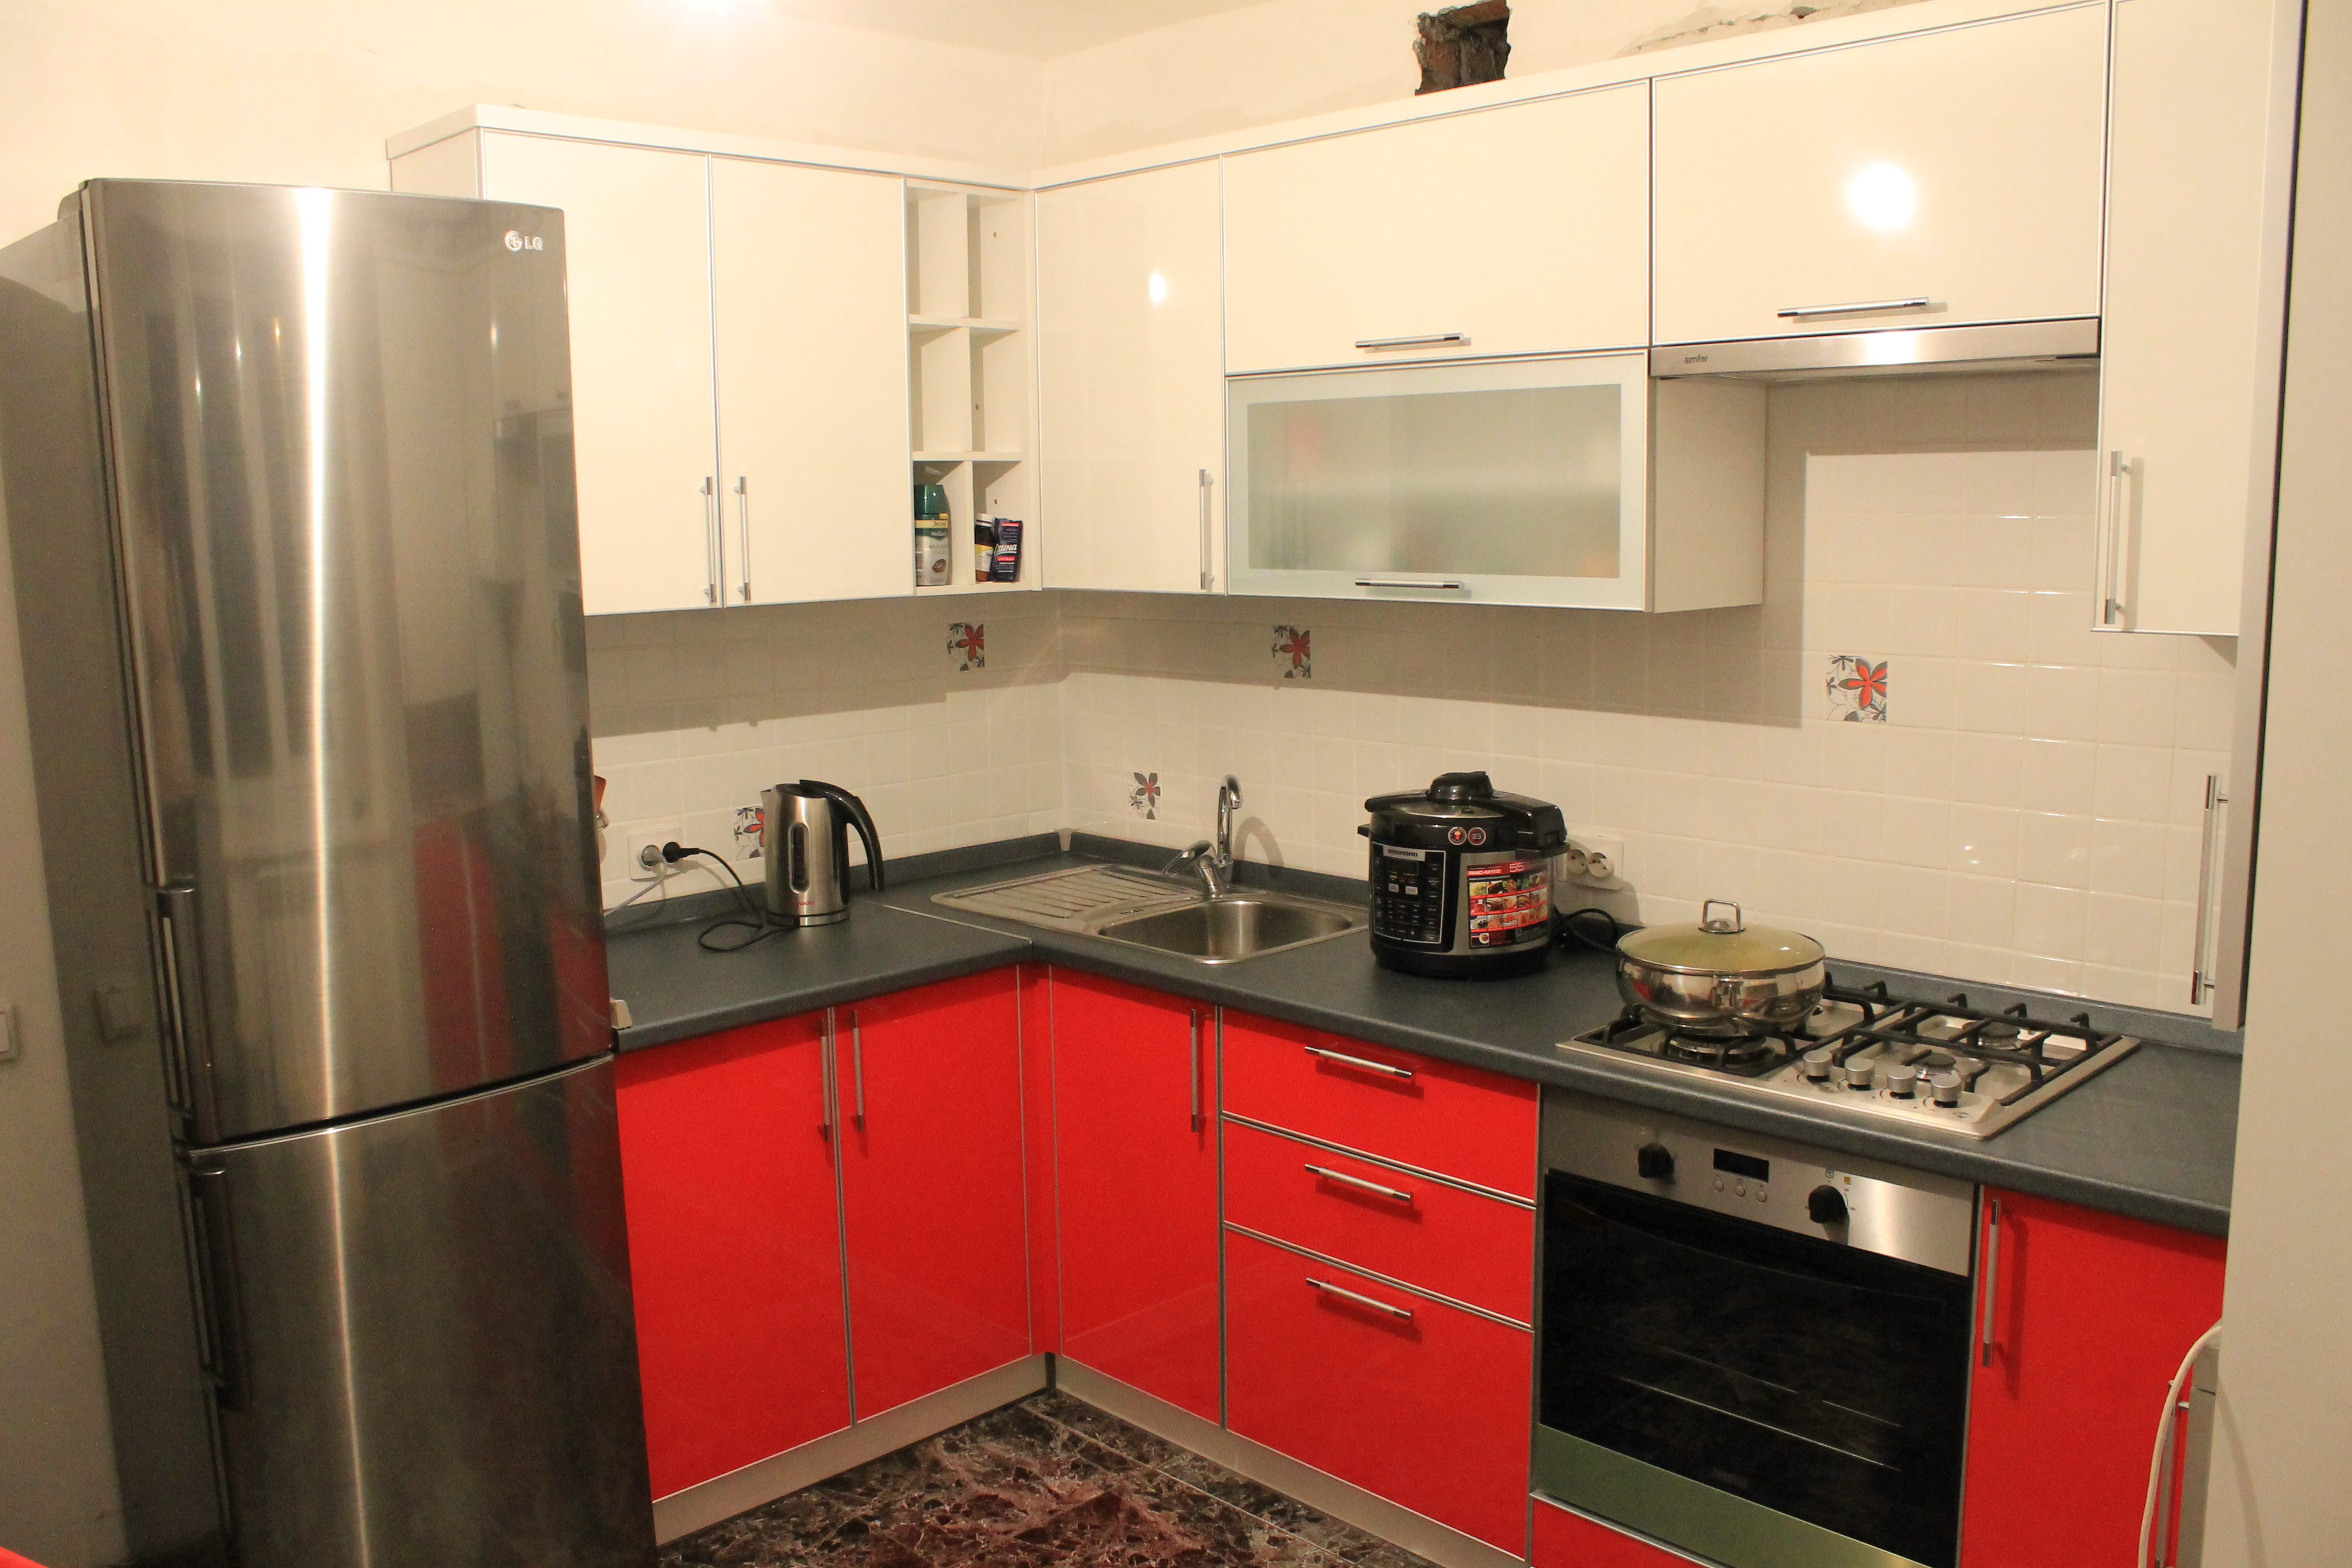 фото кухни чебоксары 015.jpg